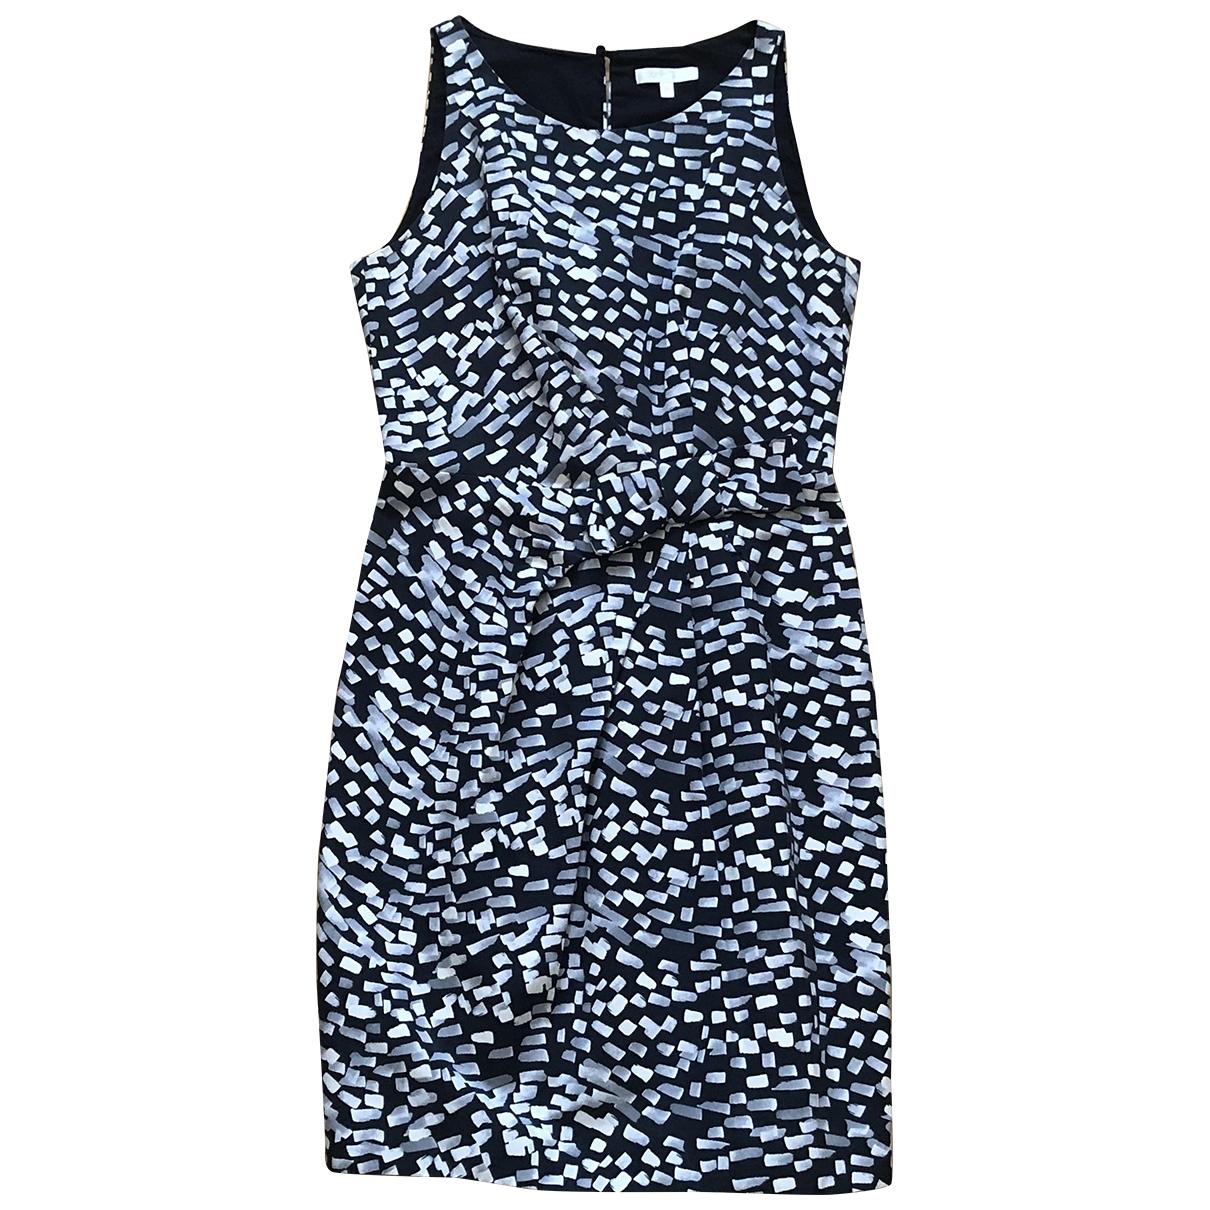 Paule Ka \N Black Cotton dress for Women 36 FR